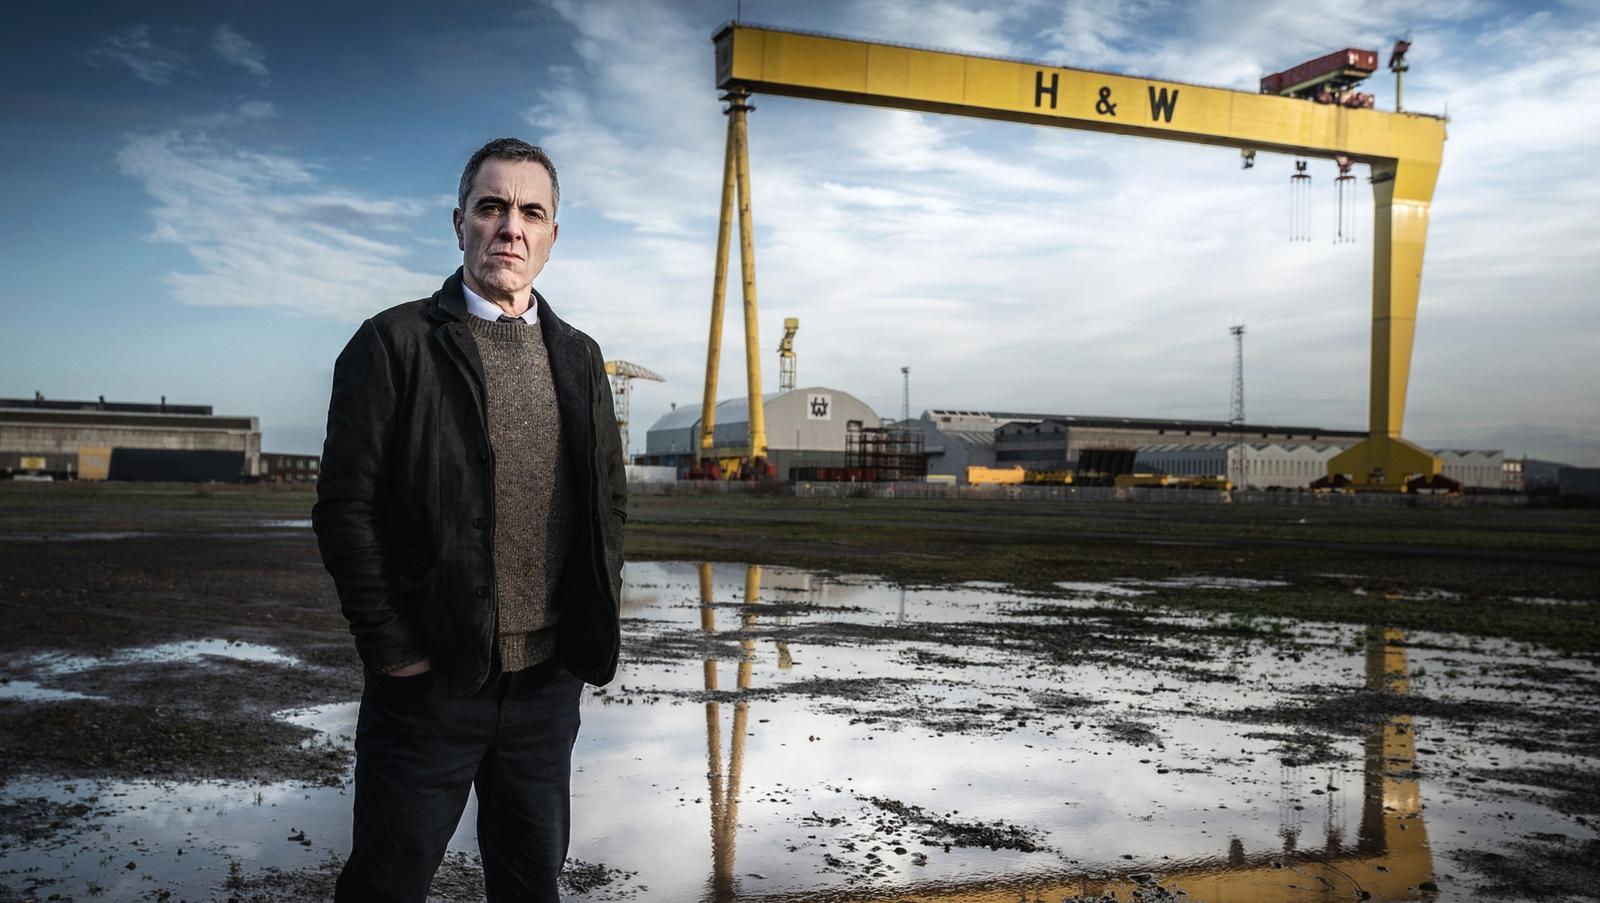 Irish stars join Nesbitt in BBC's Belfast thriller